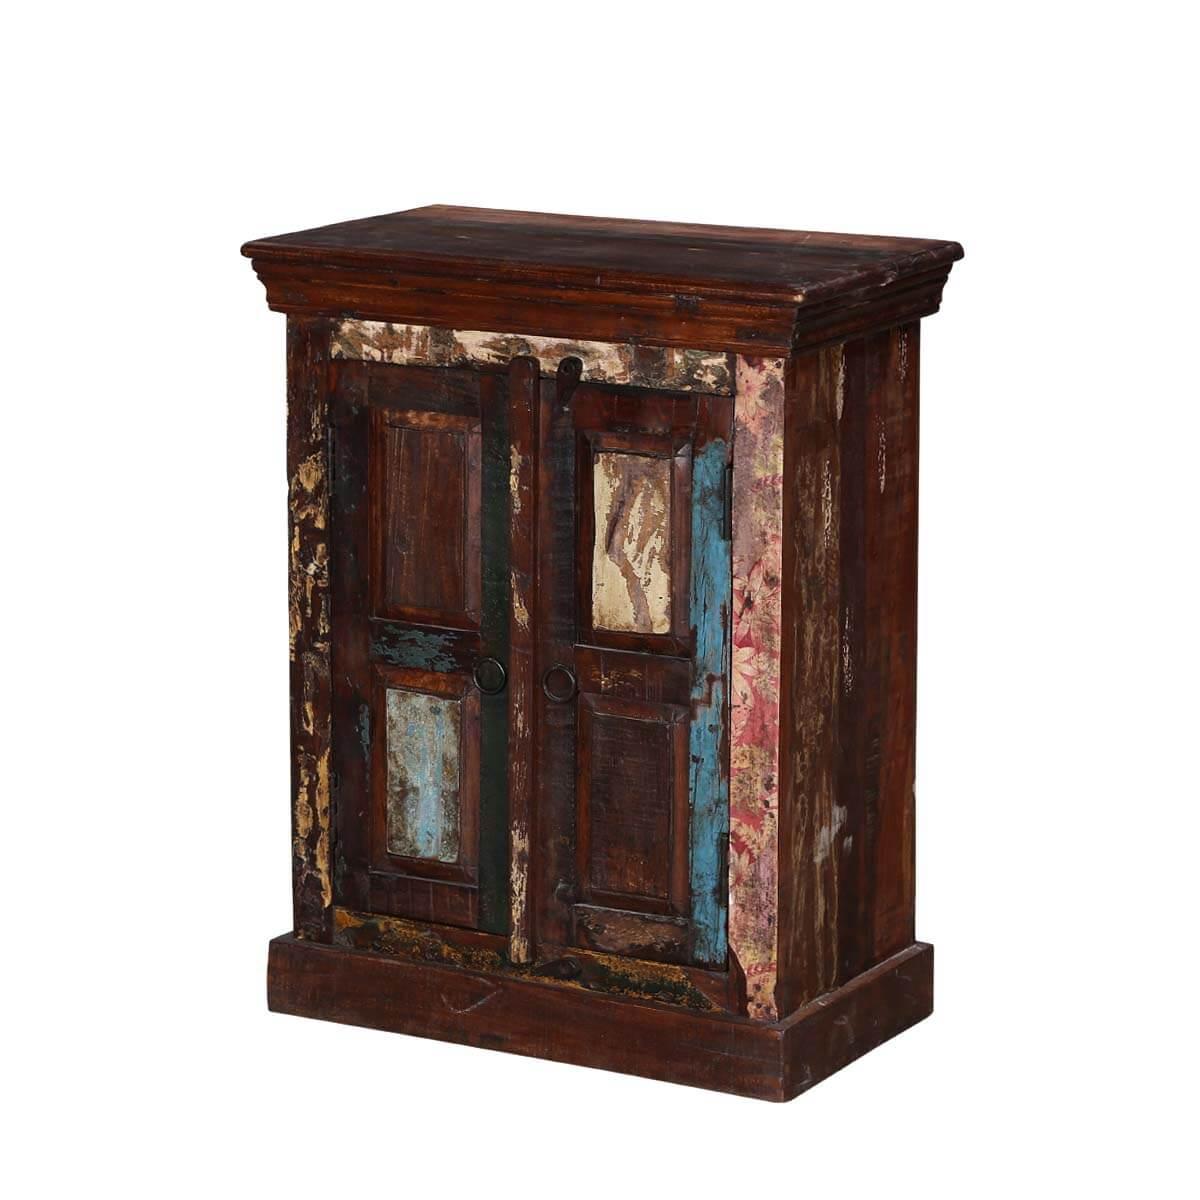 Avoca Rustic Reclaimed Wood Mini Storage Cabinet